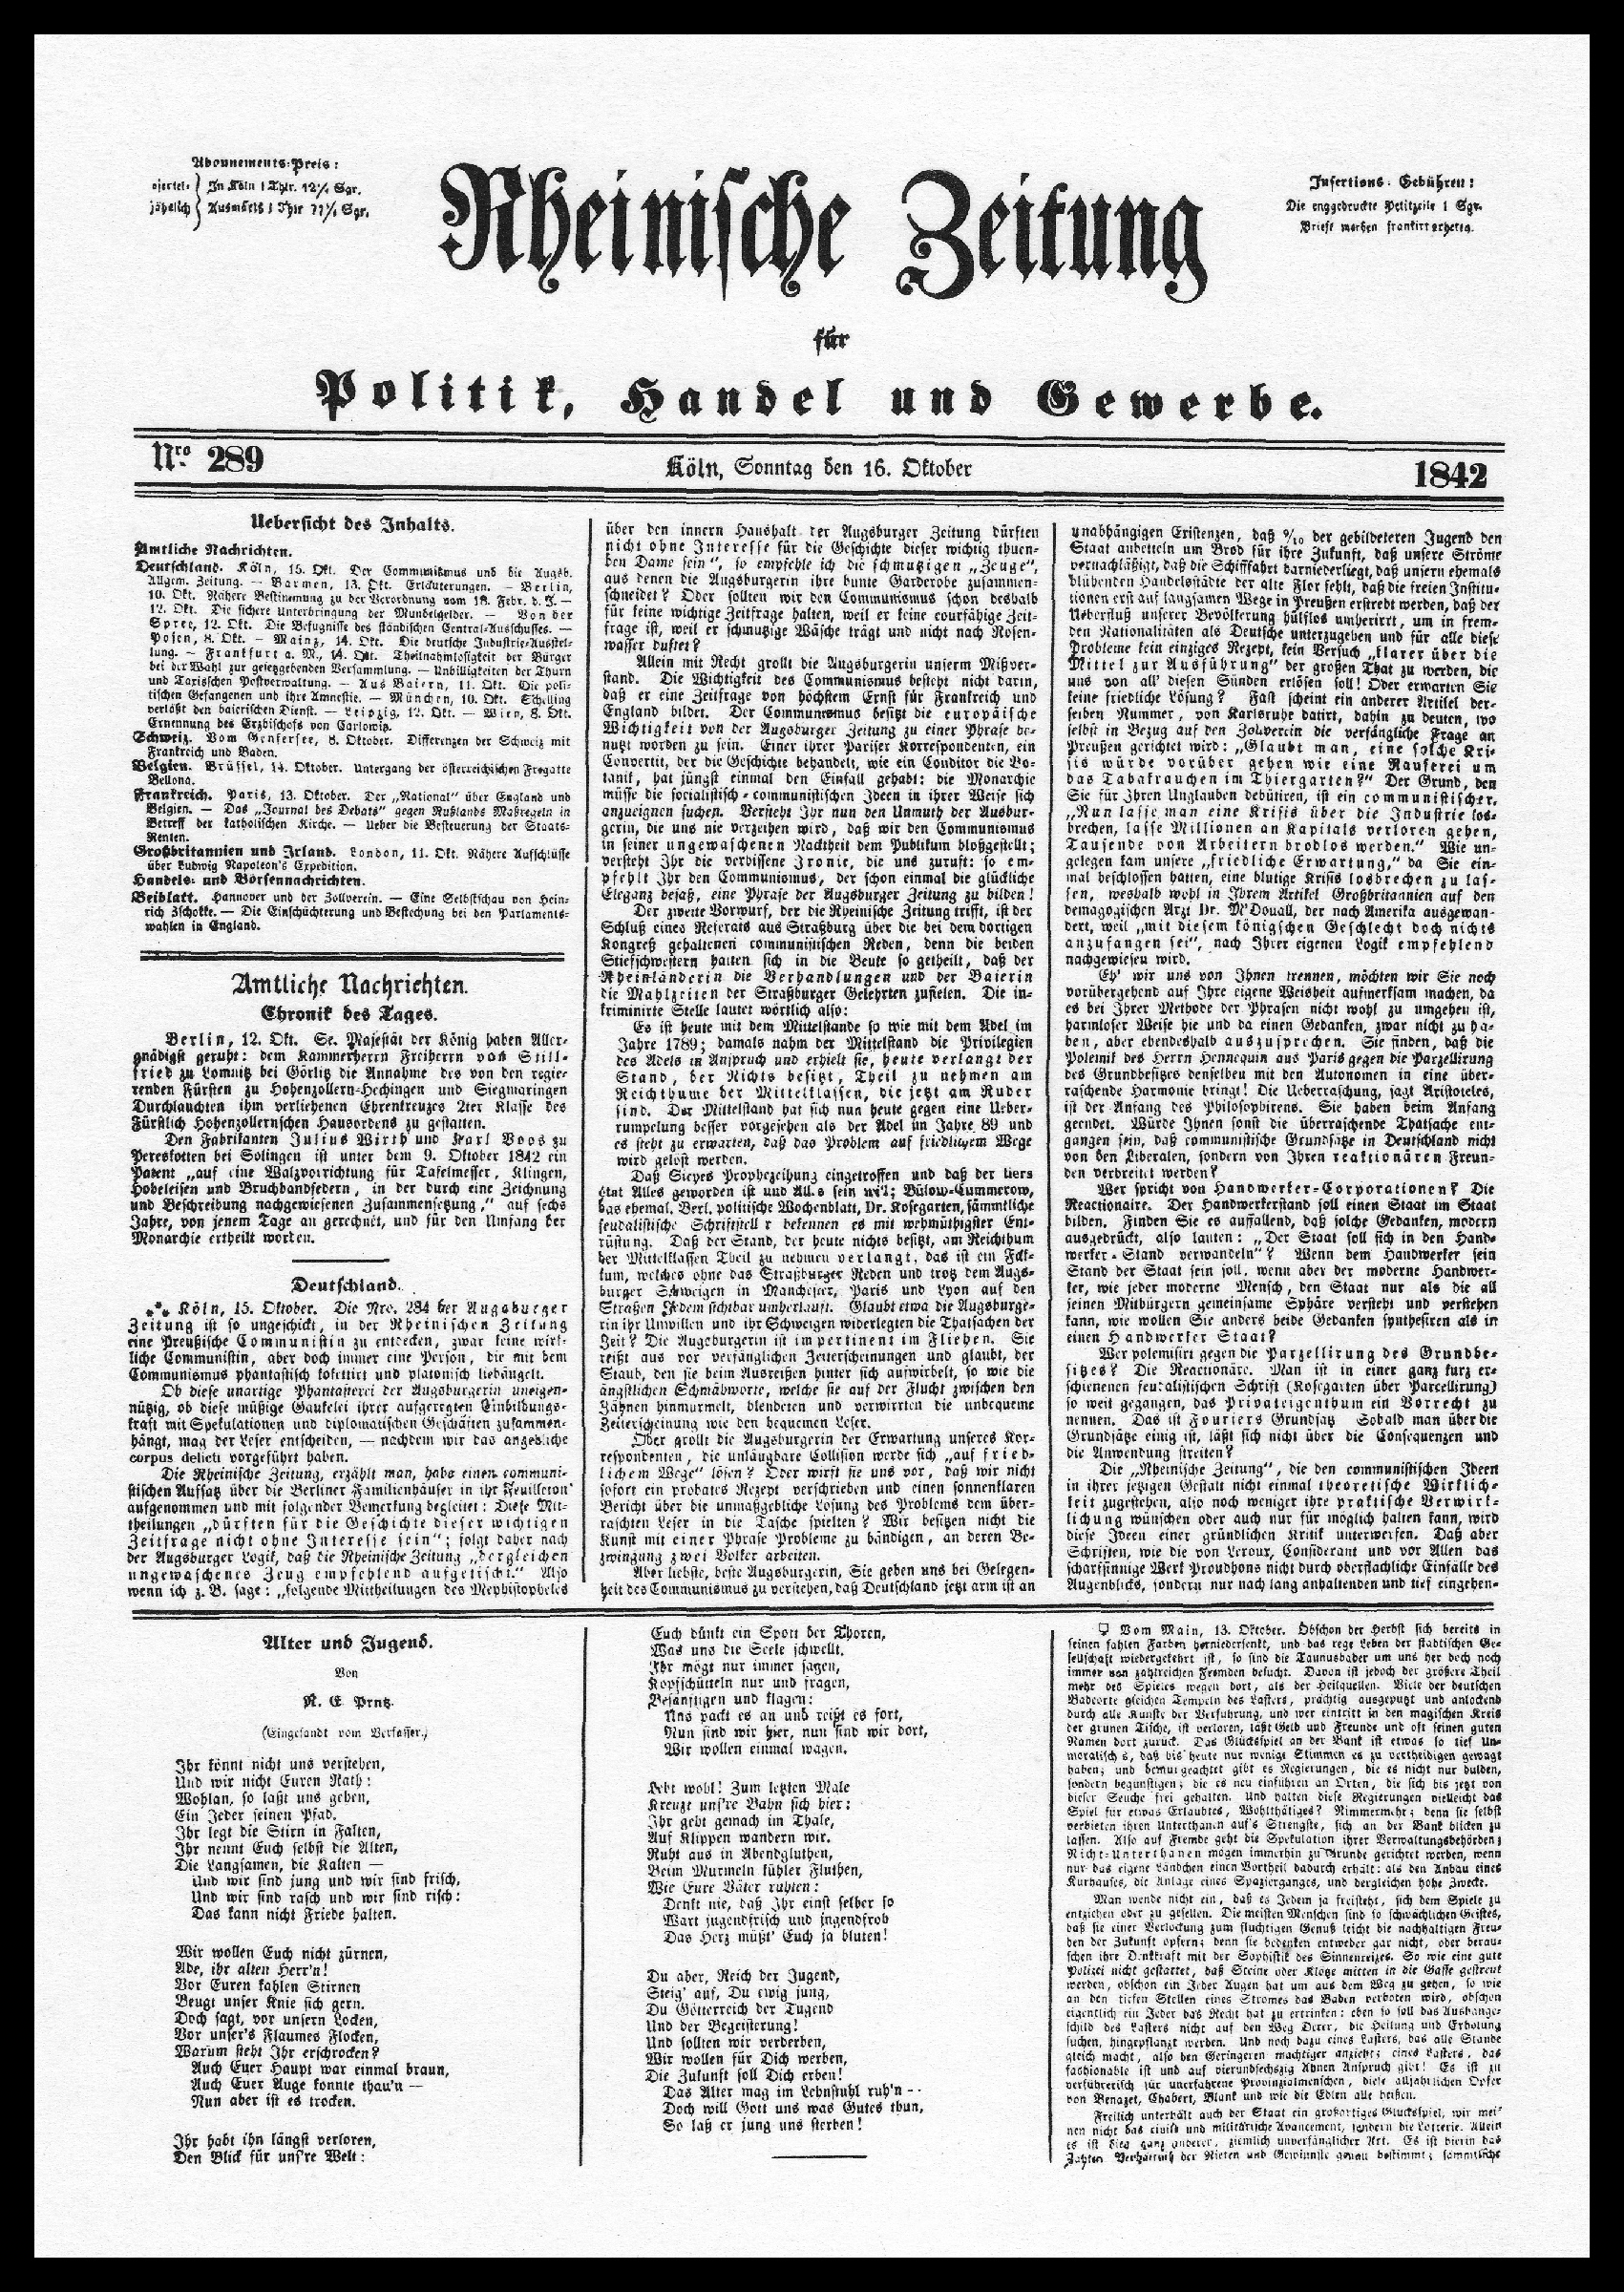 File:Rheinische-zeitung-1842a.jpg - Wikimedia Commons